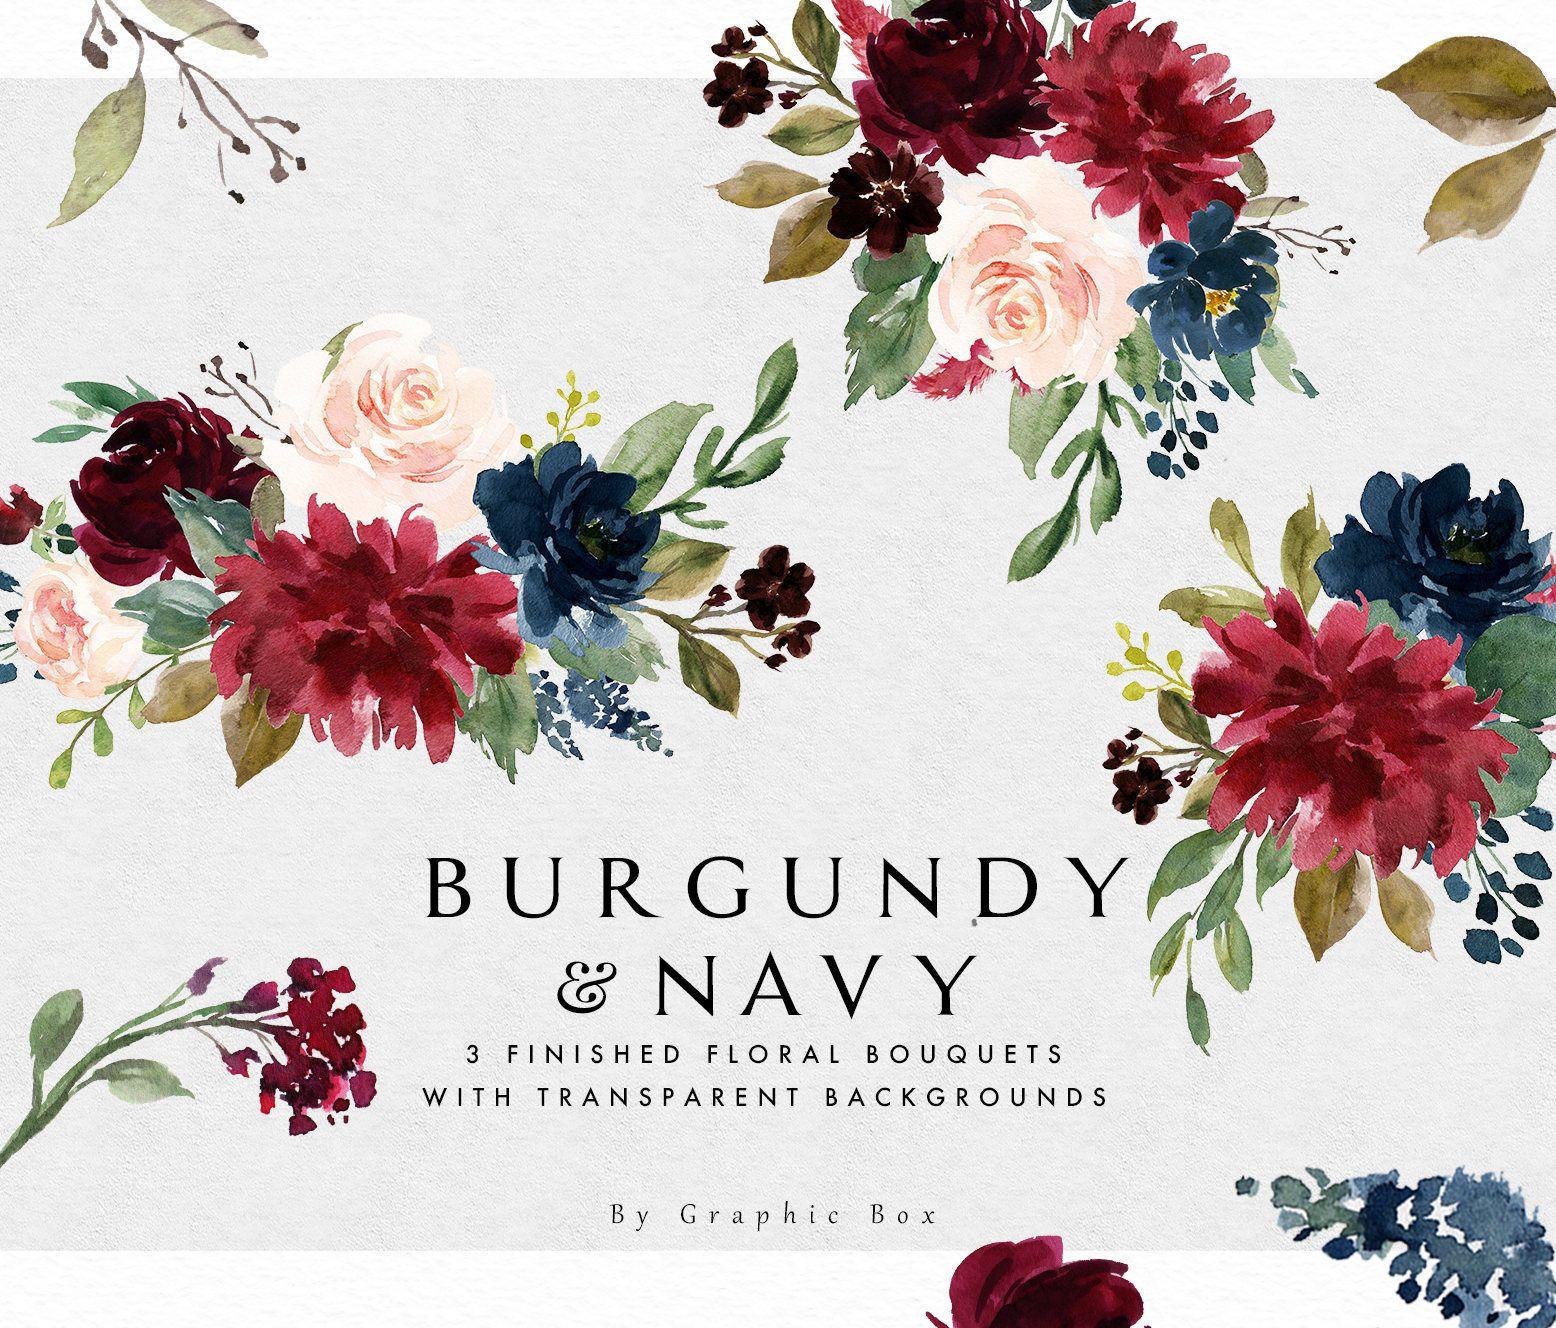 Aquarell Floral Clipart Burgund Navy Floral Elemente Kleine Etsy Floral Watercolor Clip Art Watercolor Flower Wreath